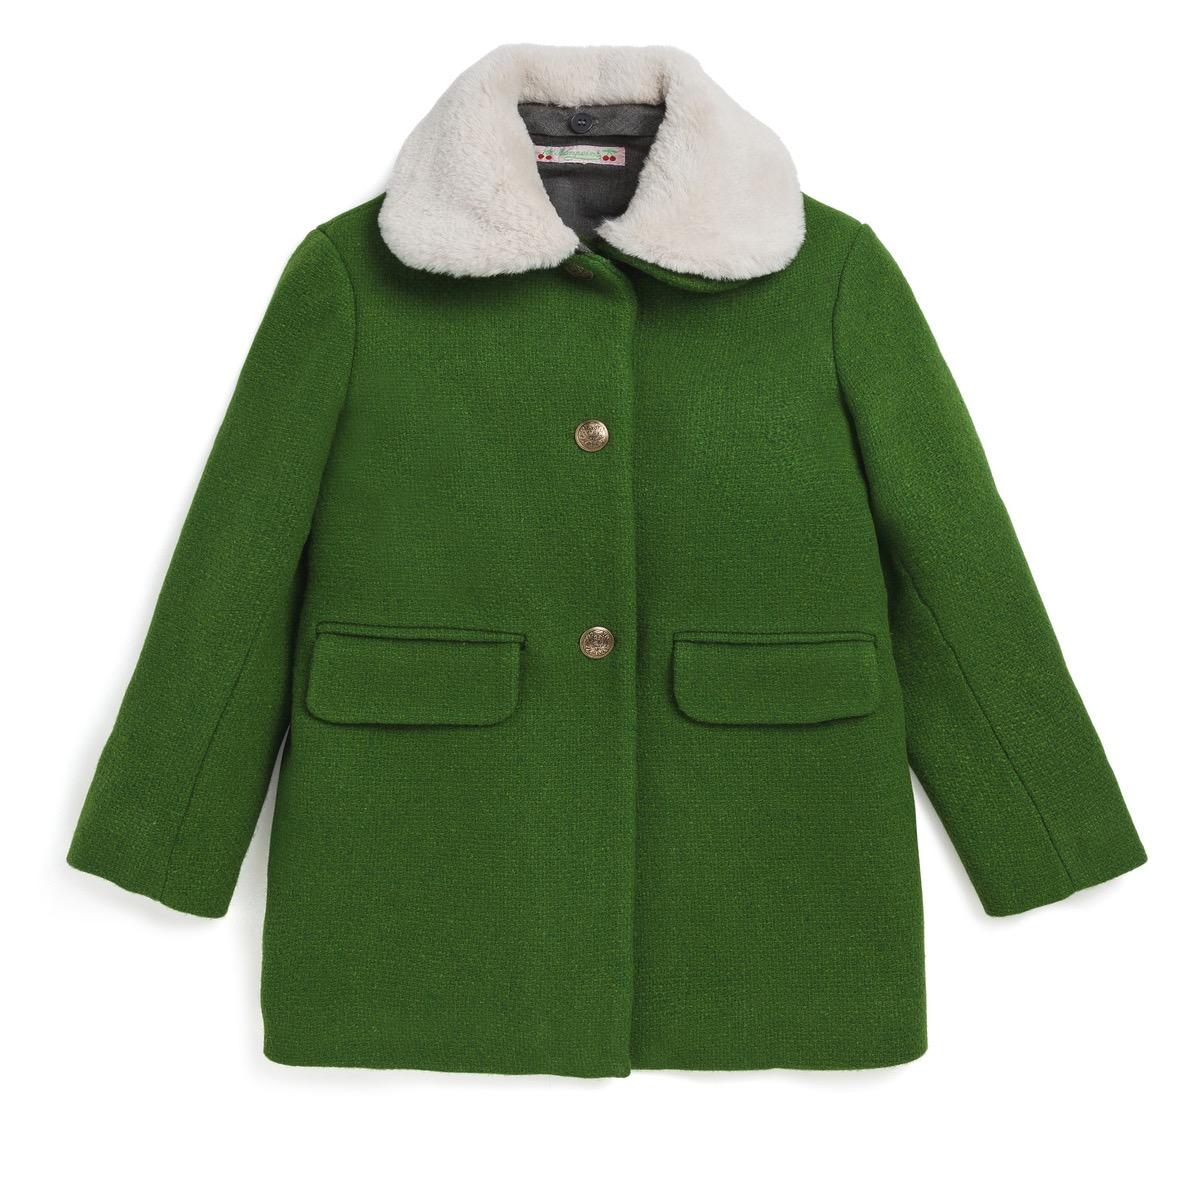 SALE bonpoint ボンポワン コート グリーンコート ファー取り外し可能 4a 6a 4歳 5歳 6歳 7歳